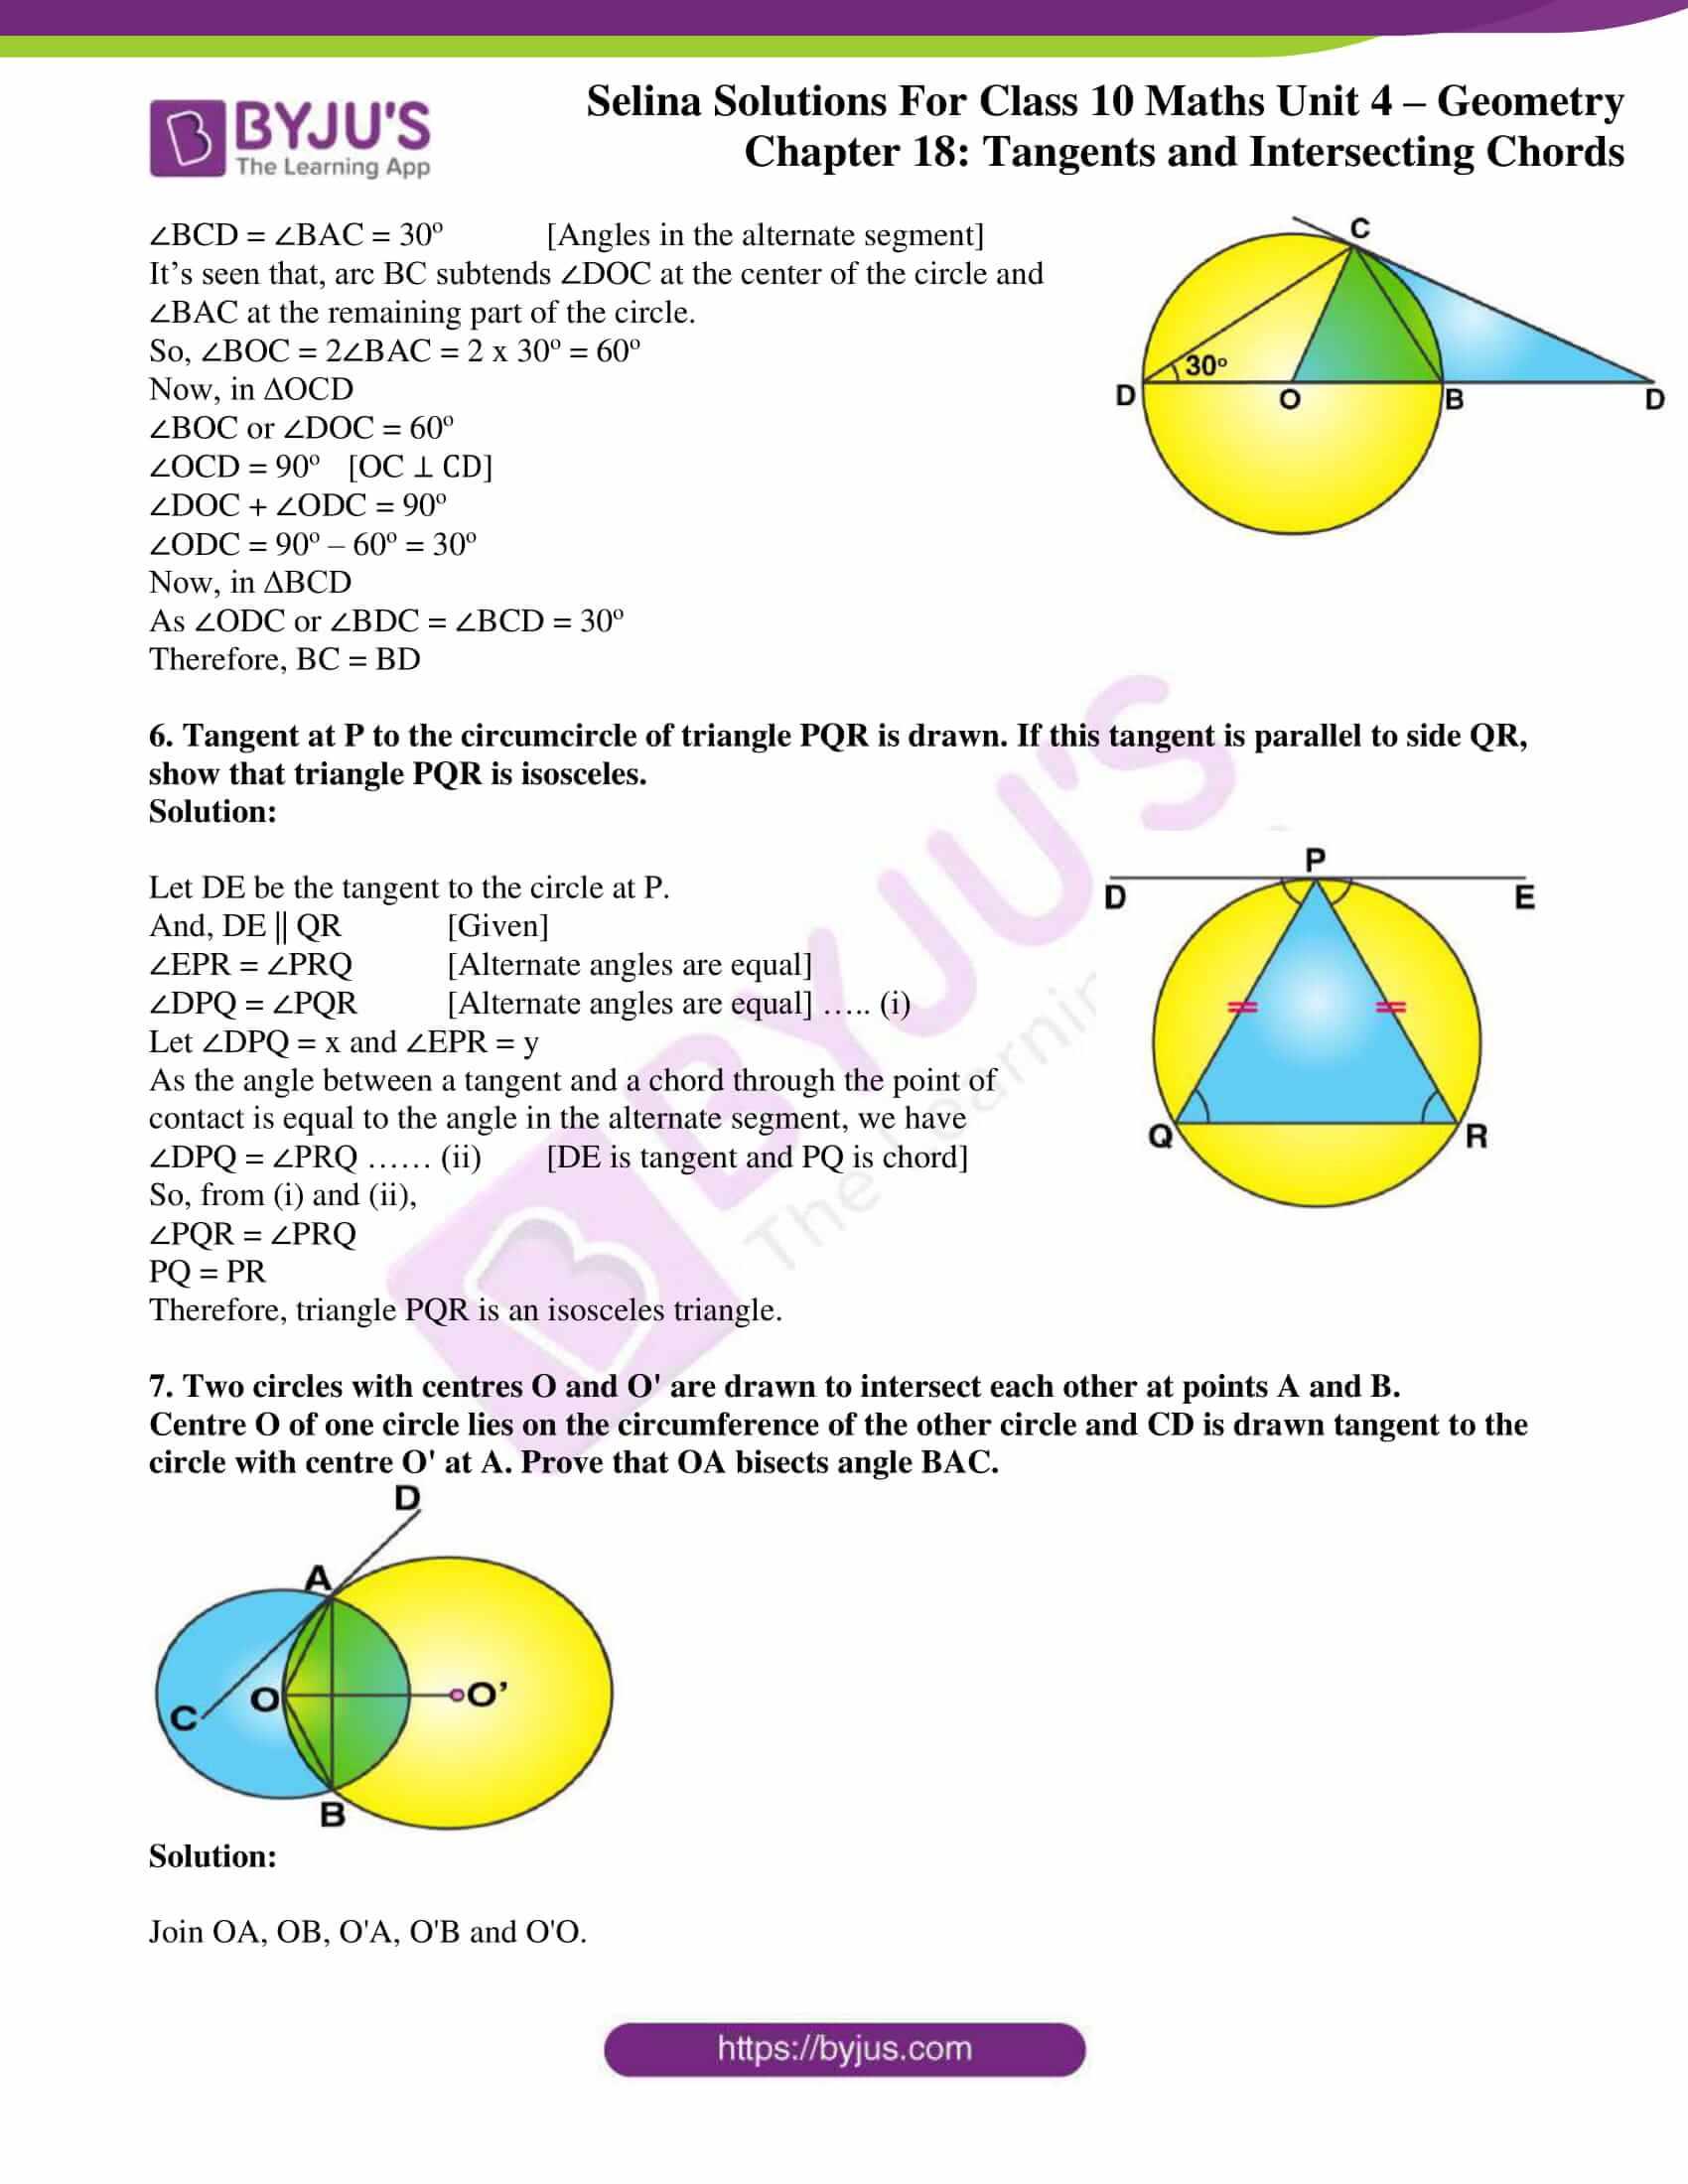 selina-sol-maths-class-10-ch-18-ex-b-4